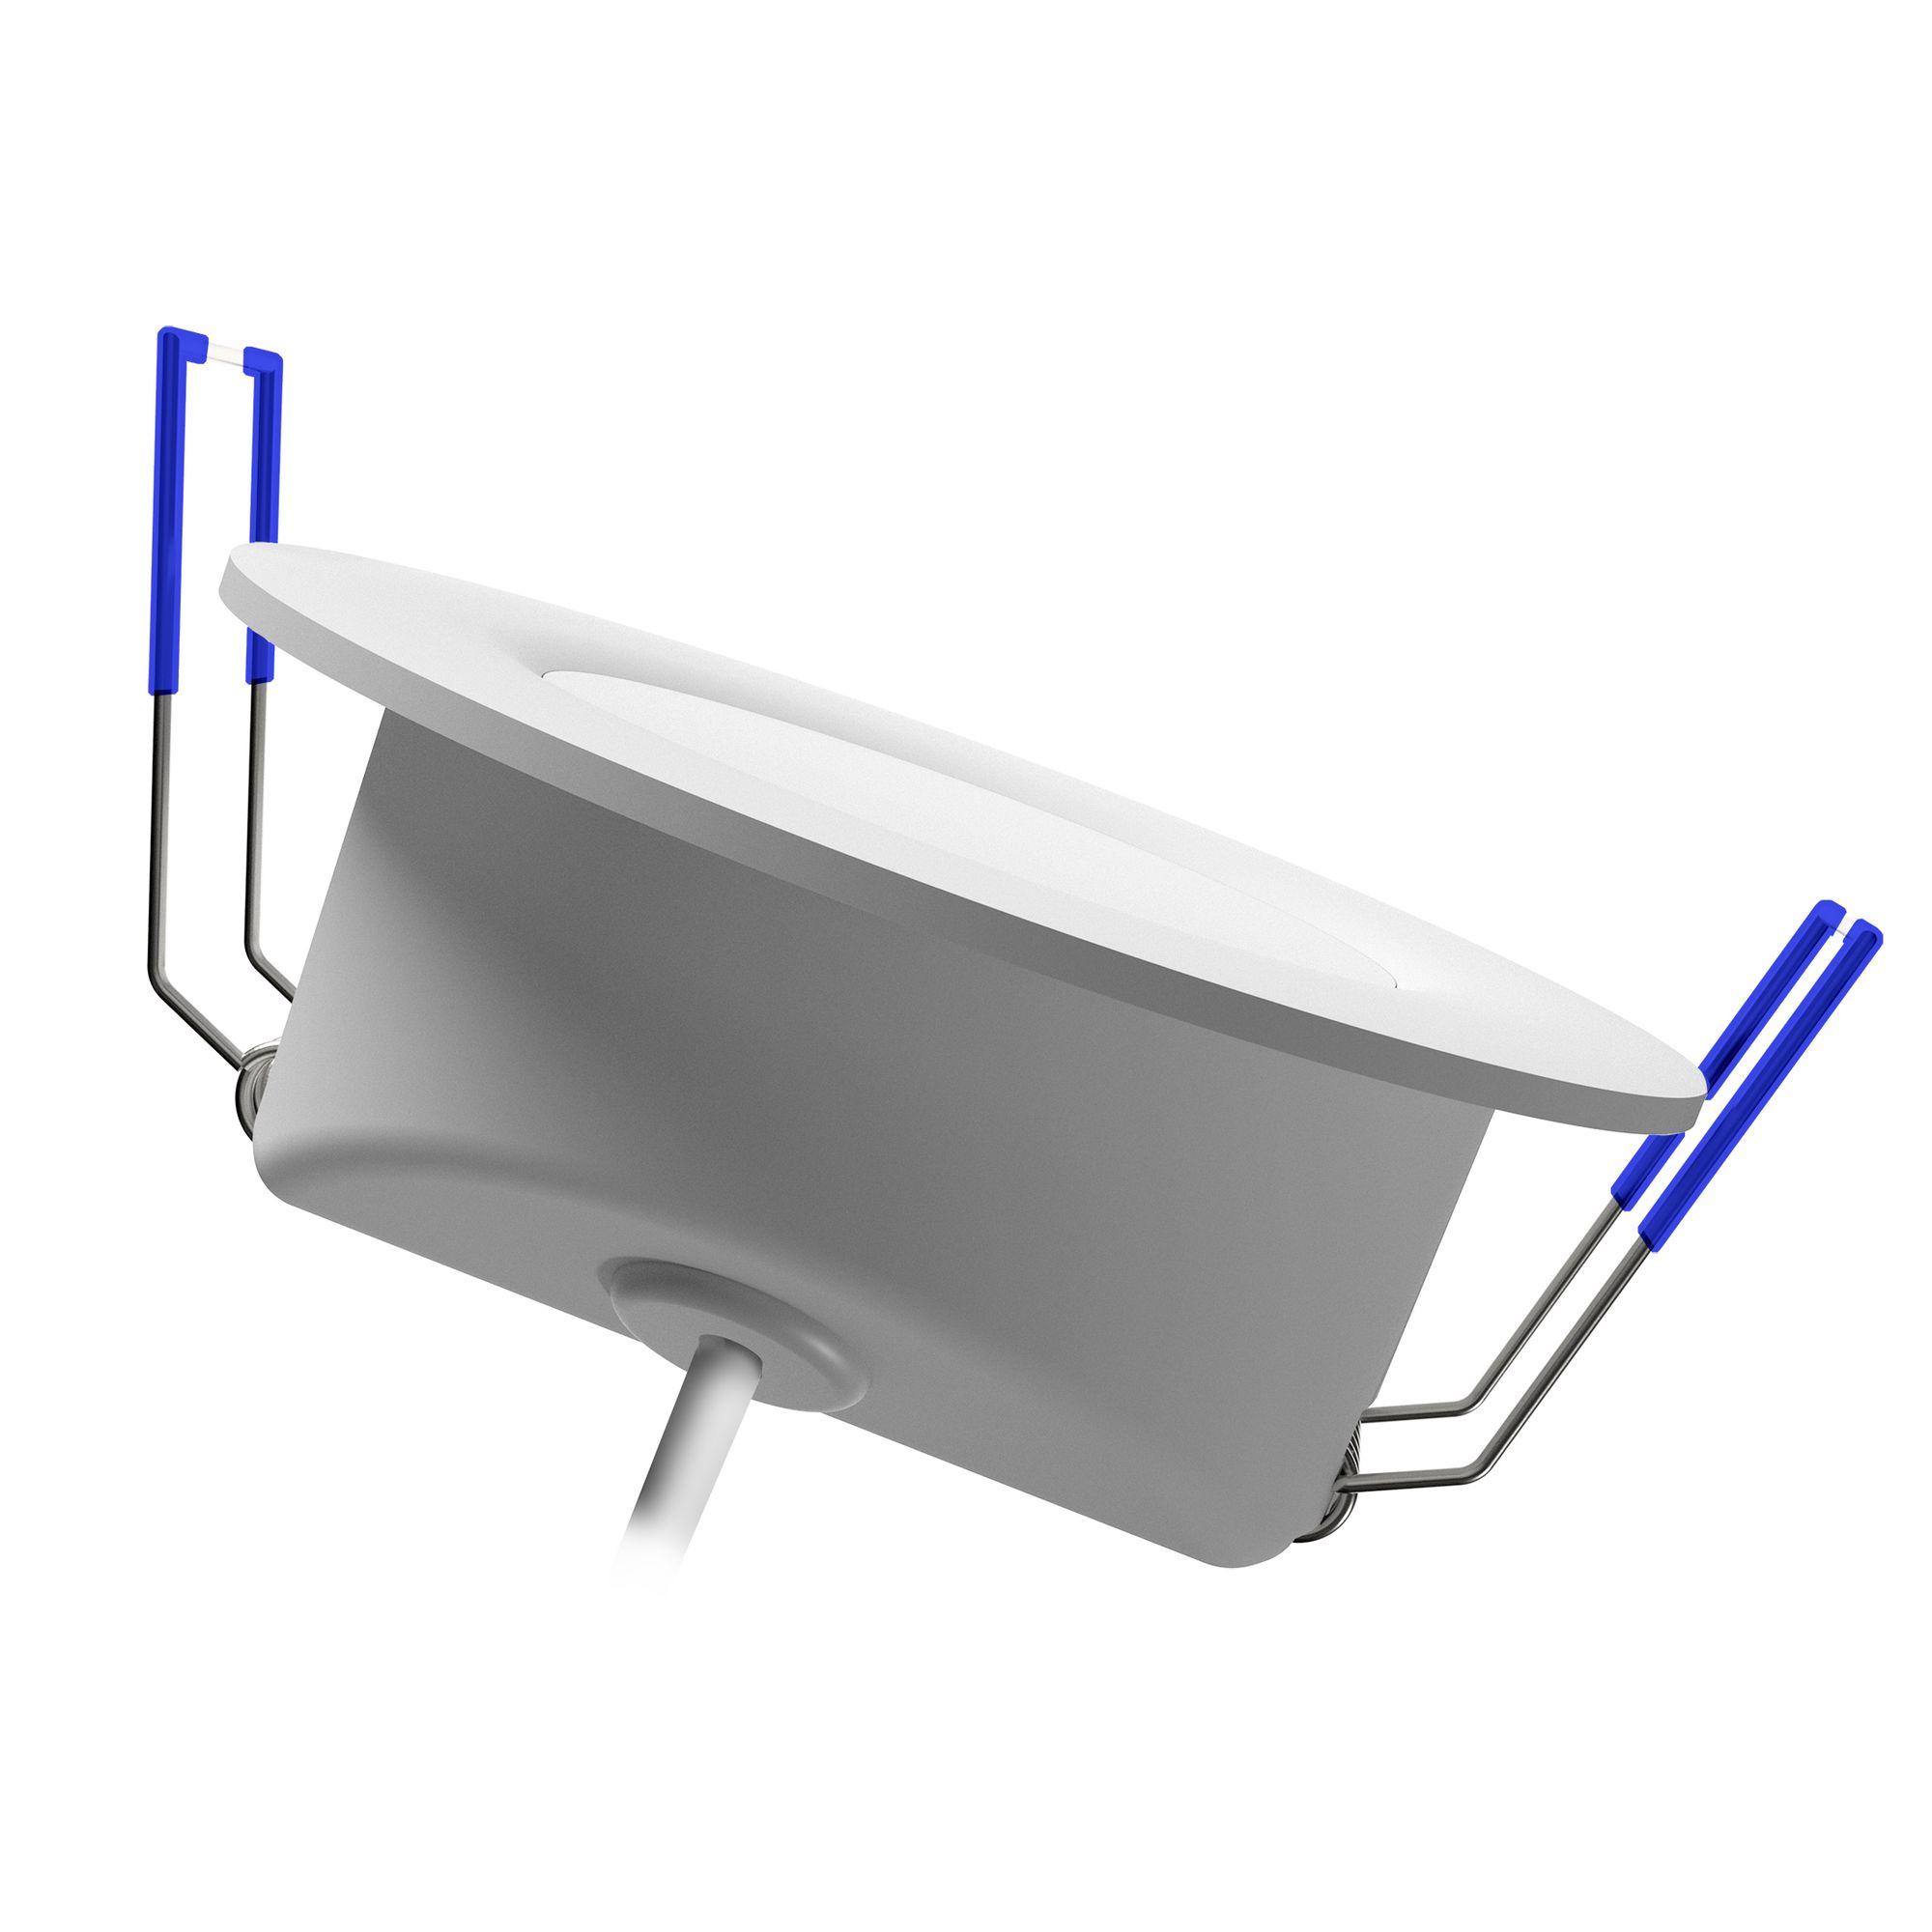 extra flache led einbaustrahler weevo dimmbar ip44 spots rund 4000k 6 5w f r bad au en. Black Bedroom Furniture Sets. Home Design Ideas